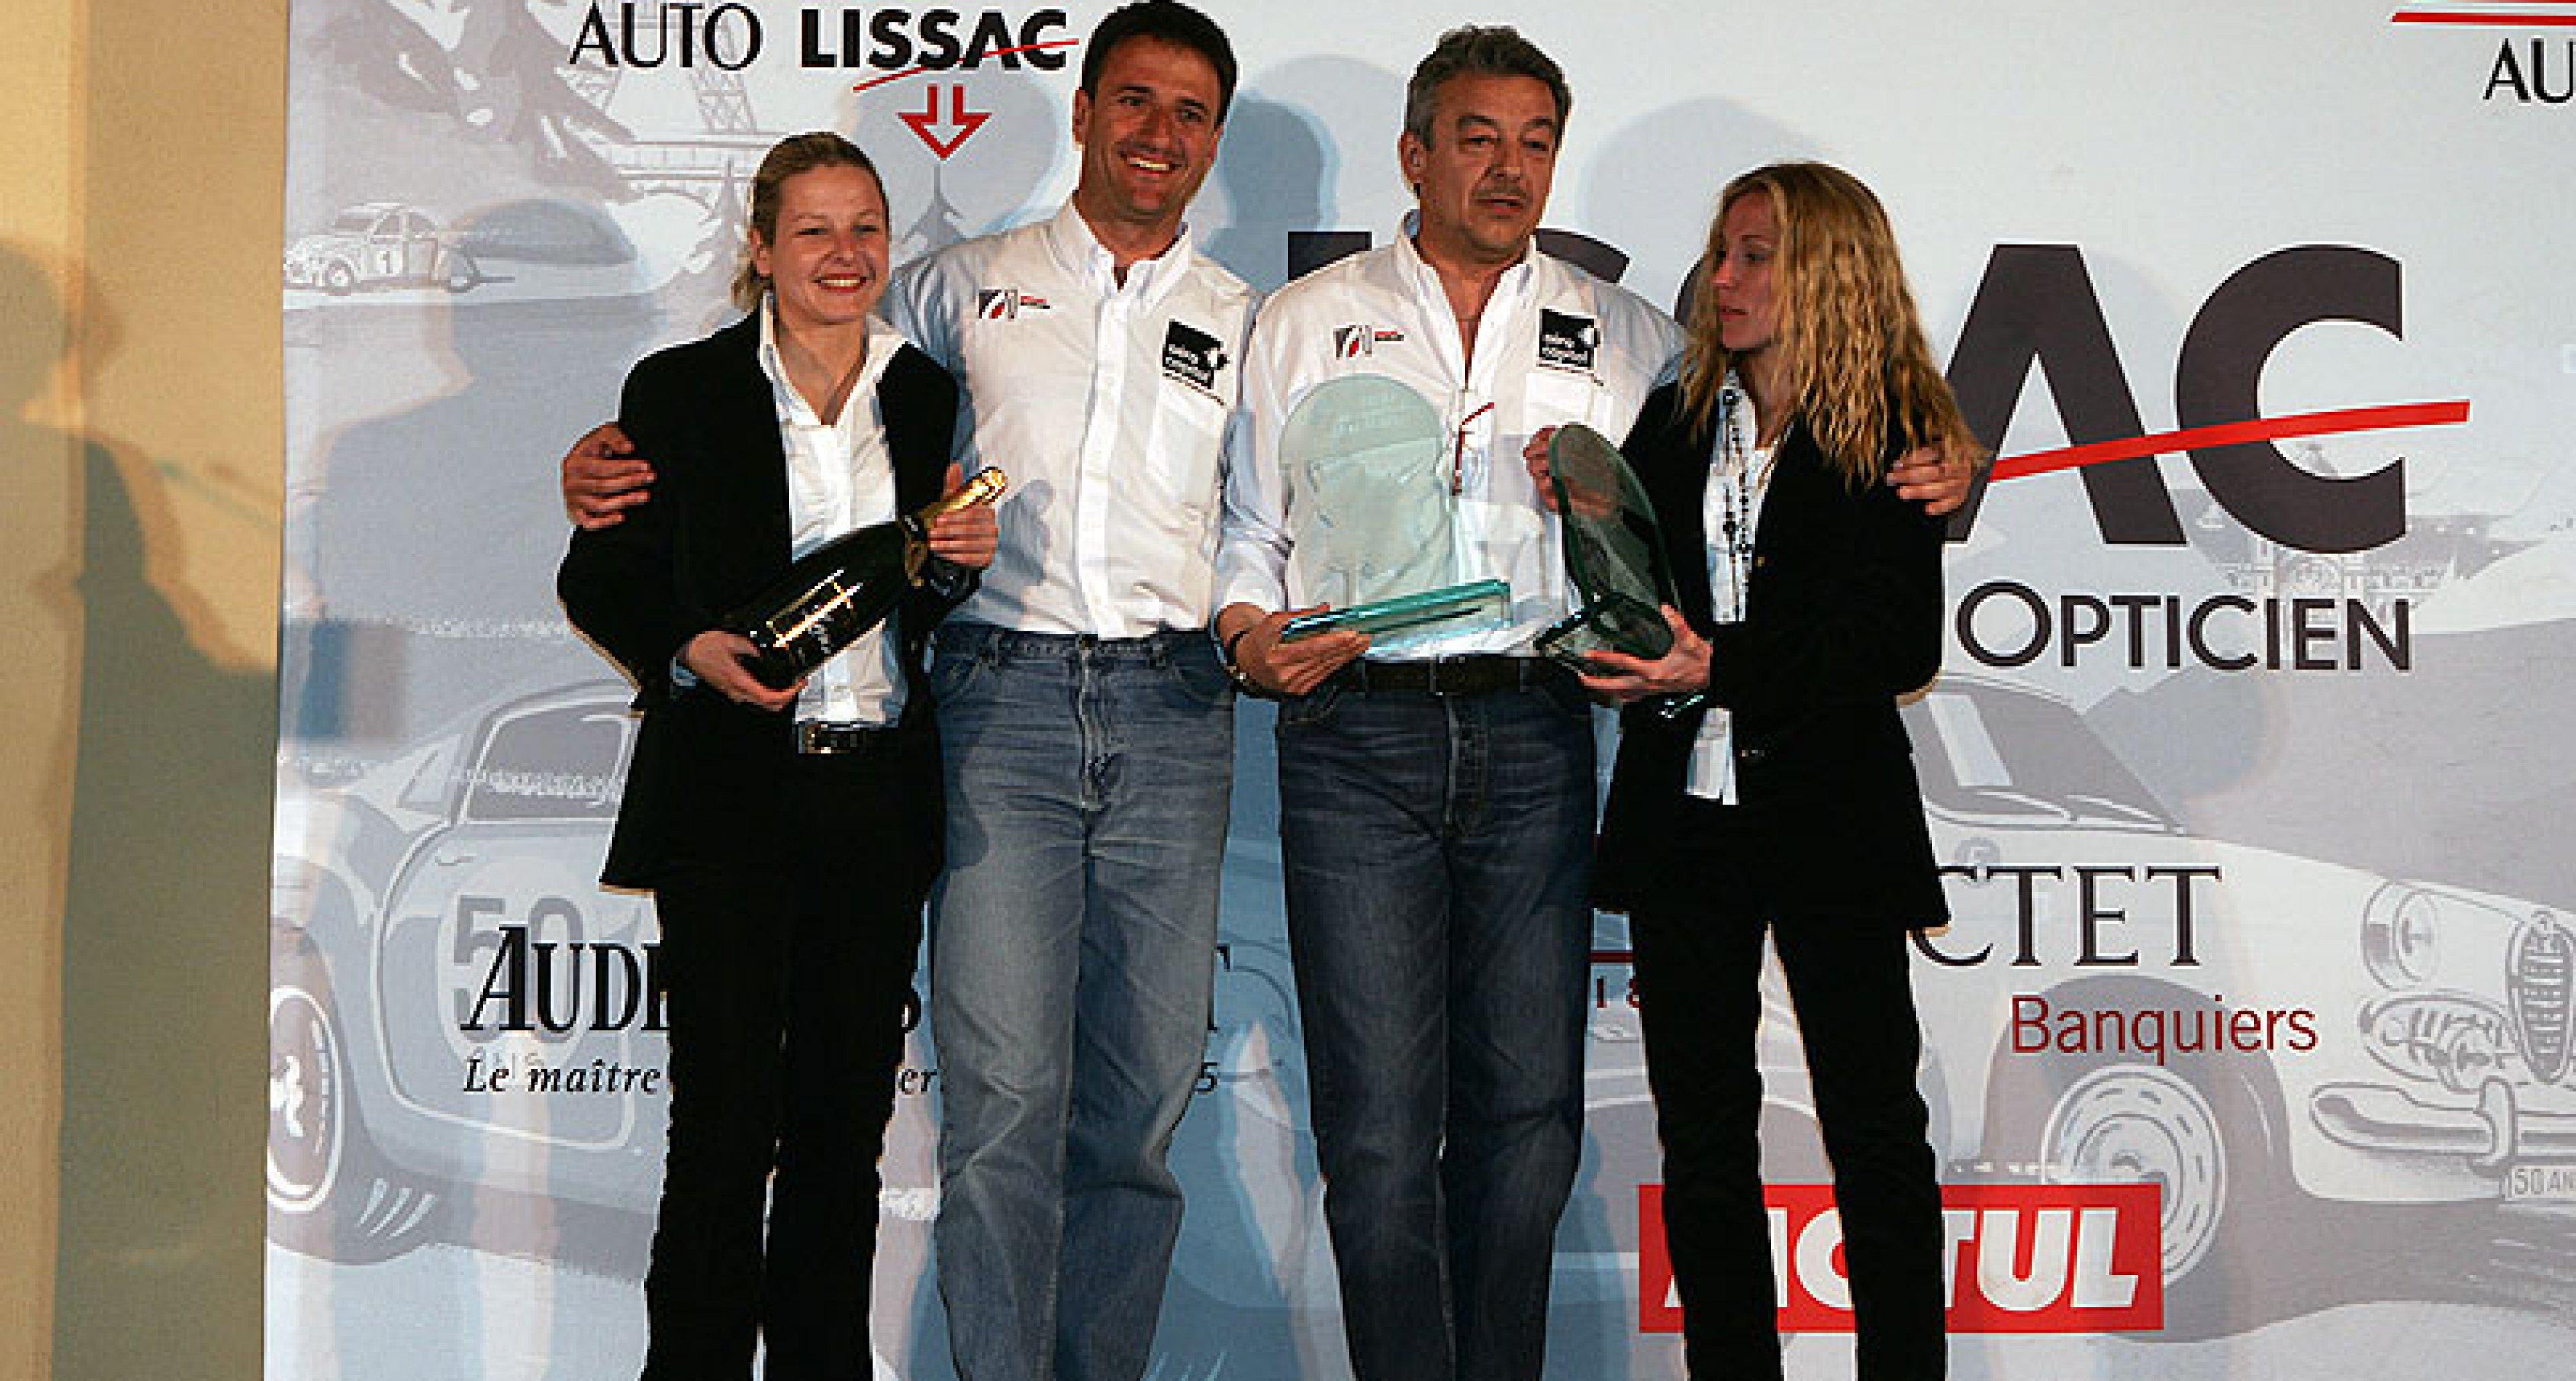 Tour Auto Lissac 2008 – results